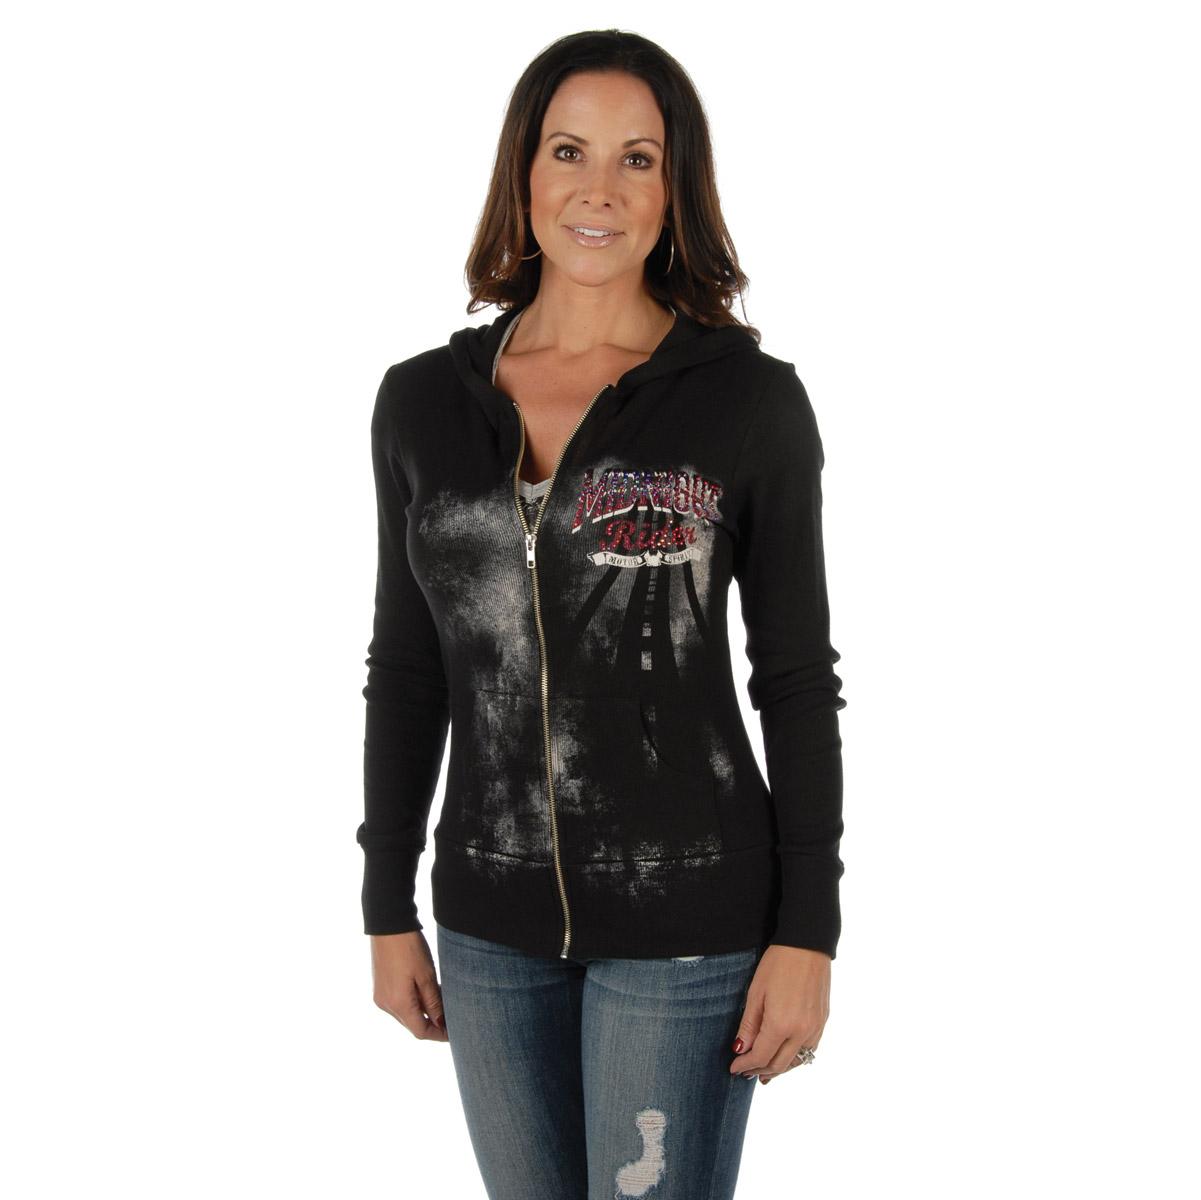 Liberty Wear Women's Midnight Rider Black Hoodie